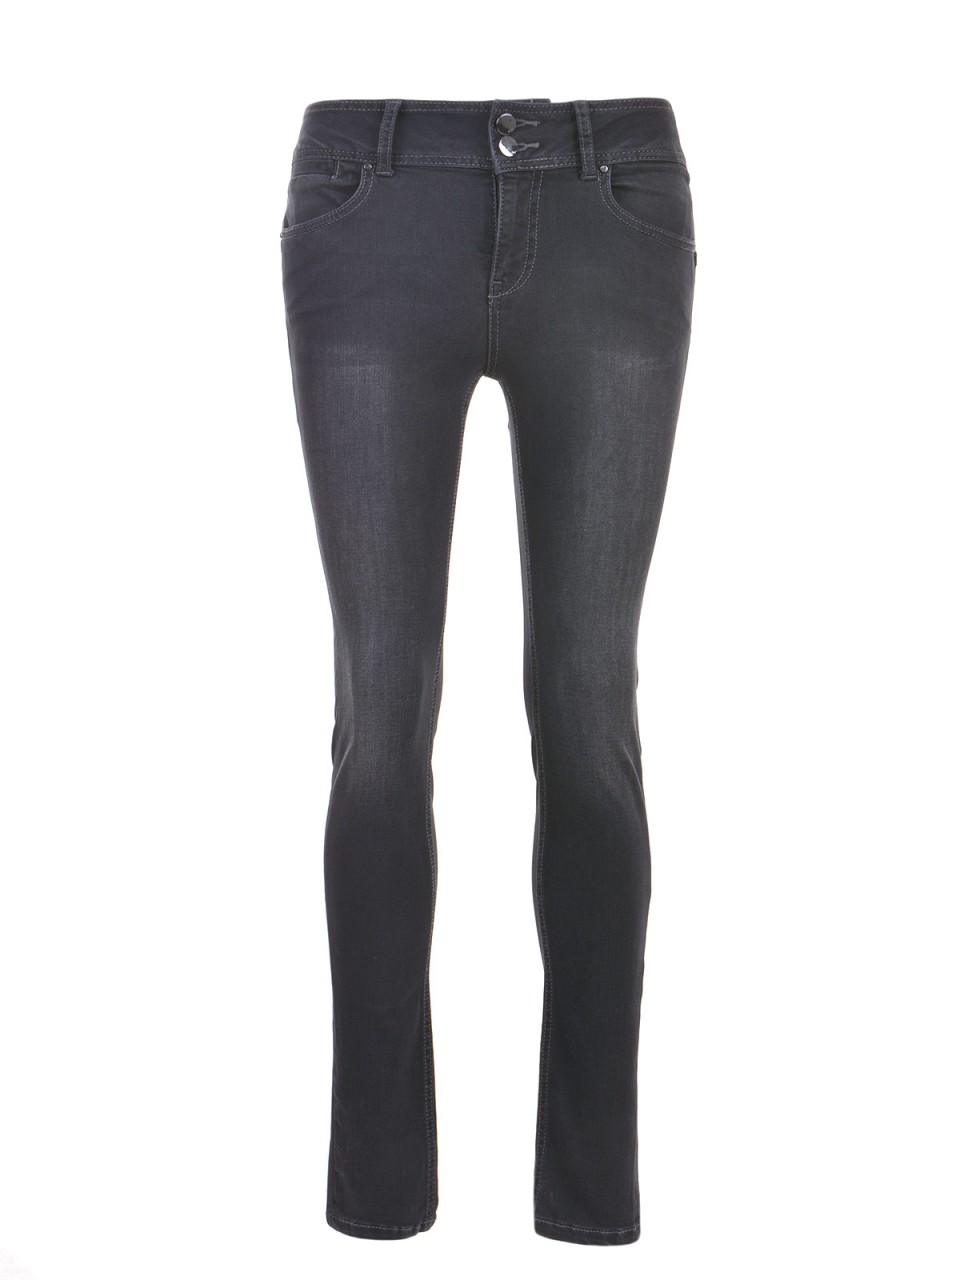 att-damen-jeans-schwarz